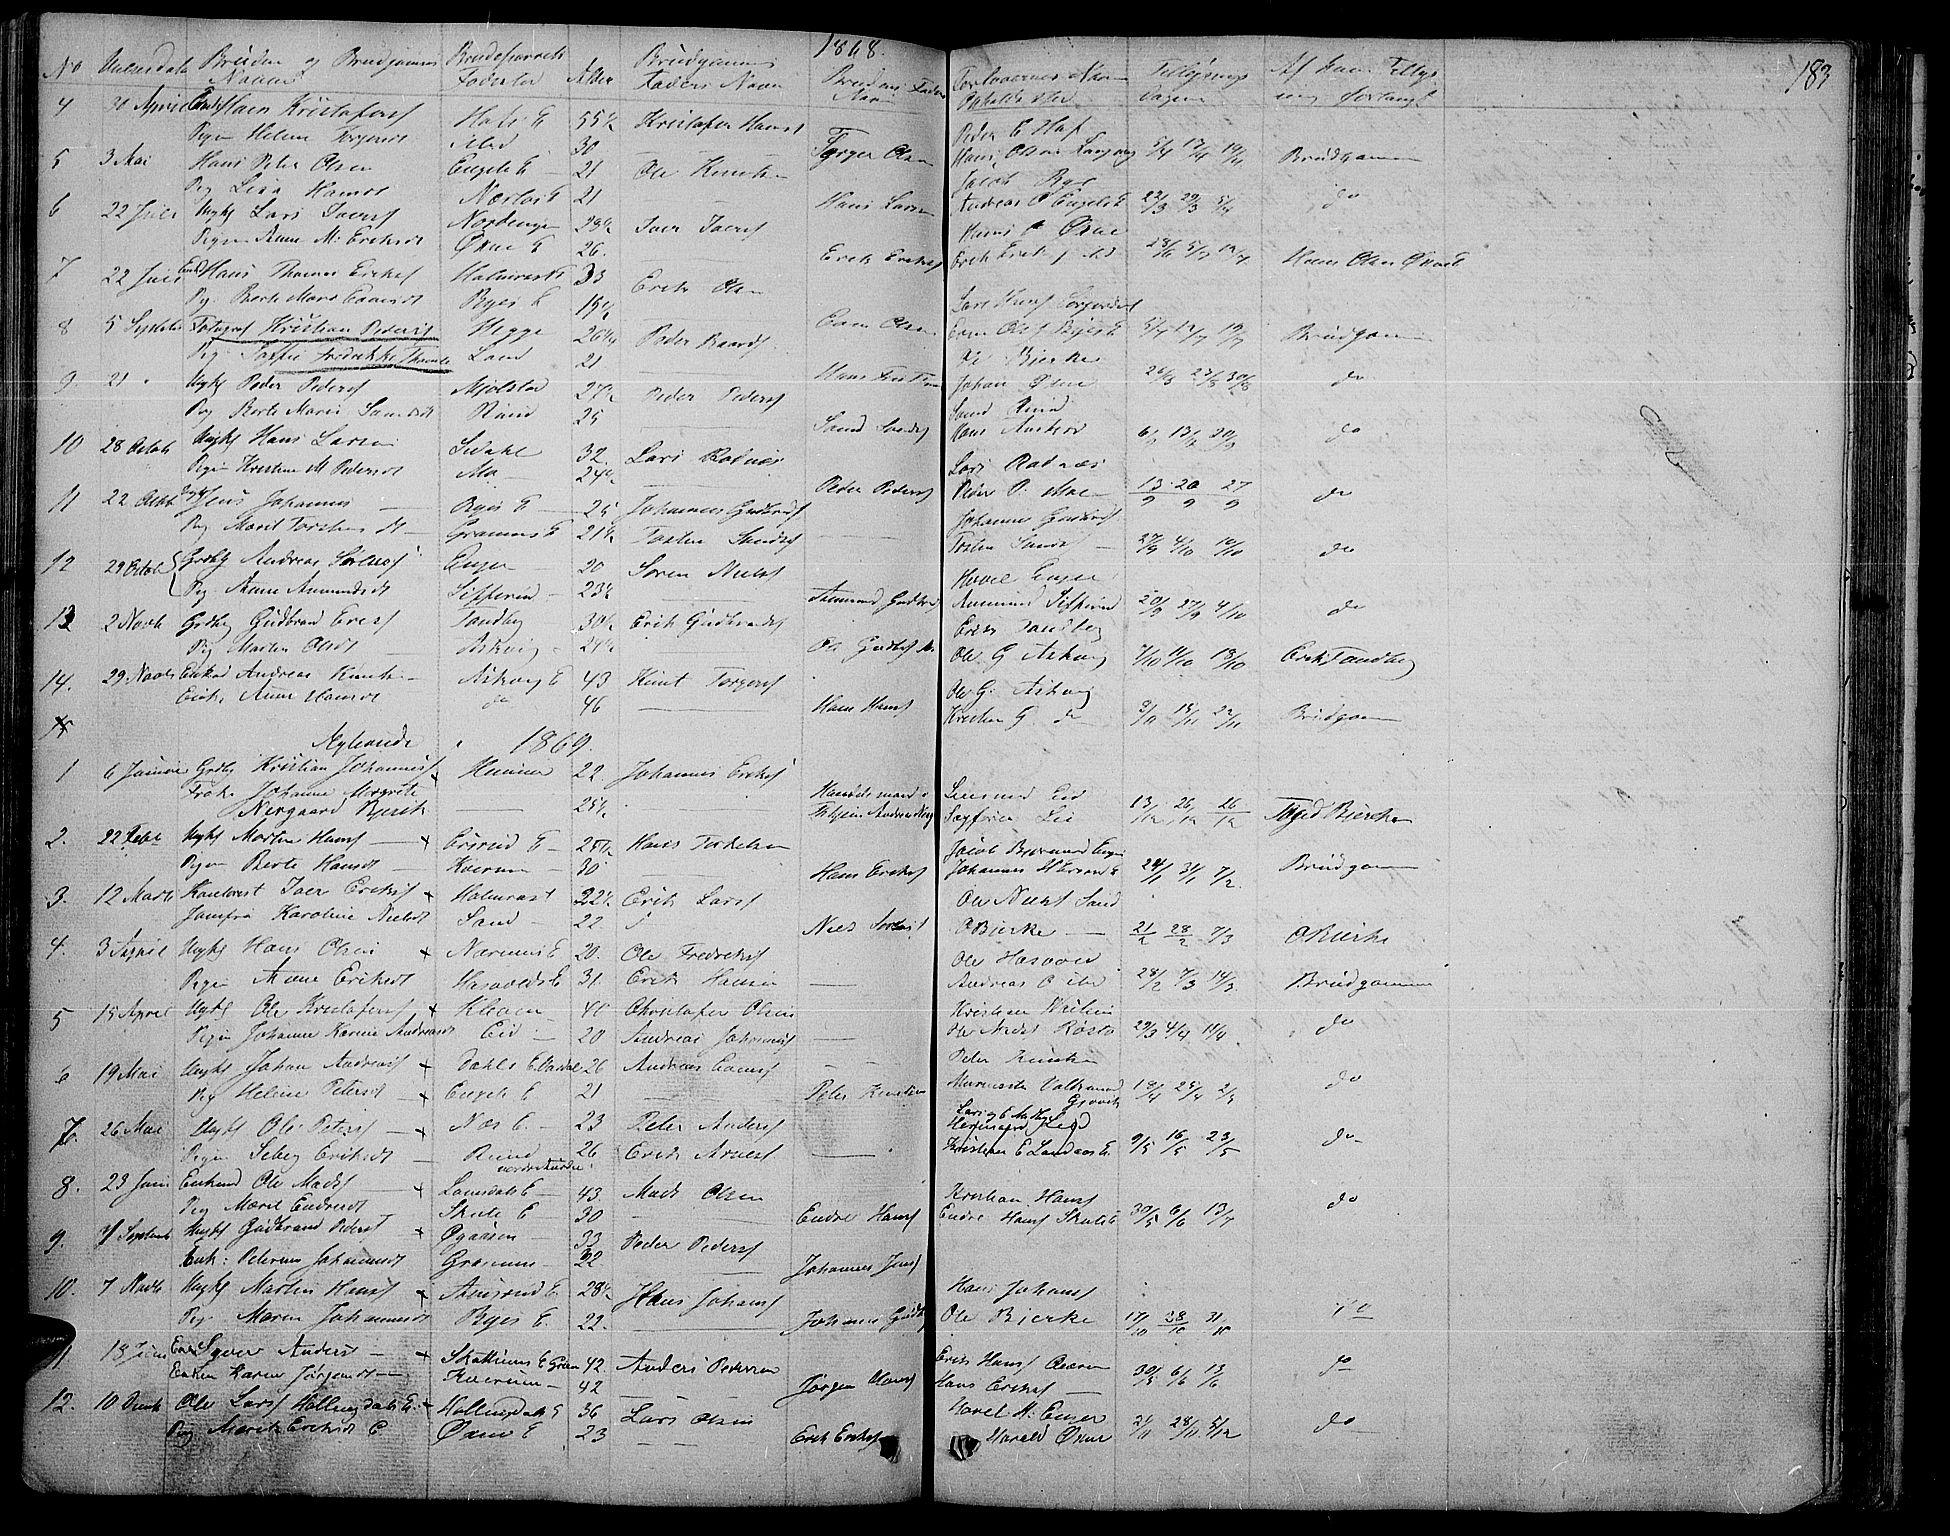 SAH, Søndre Land prestekontor, L/L0001: Klokkerbok nr. 1, 1849-1883, s. 183